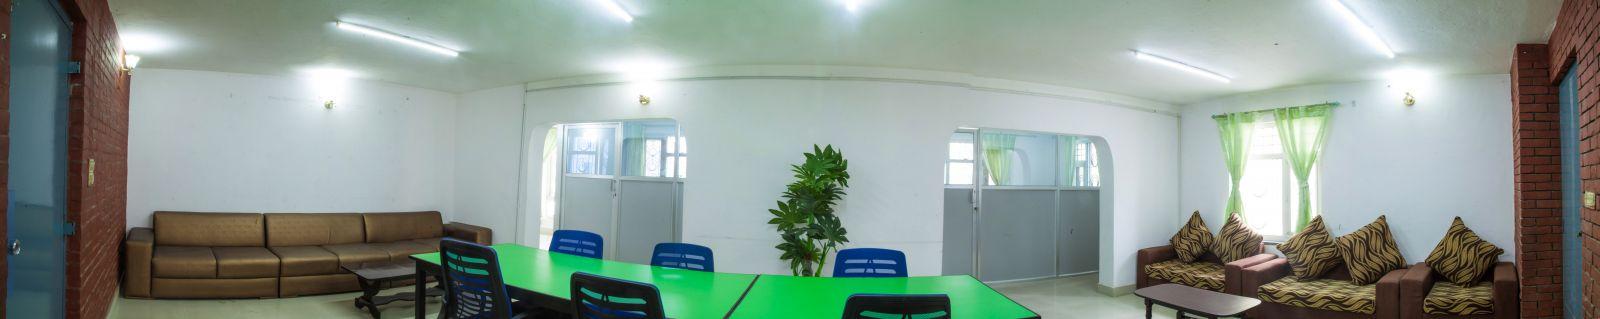 MERO OFFICE, Patan